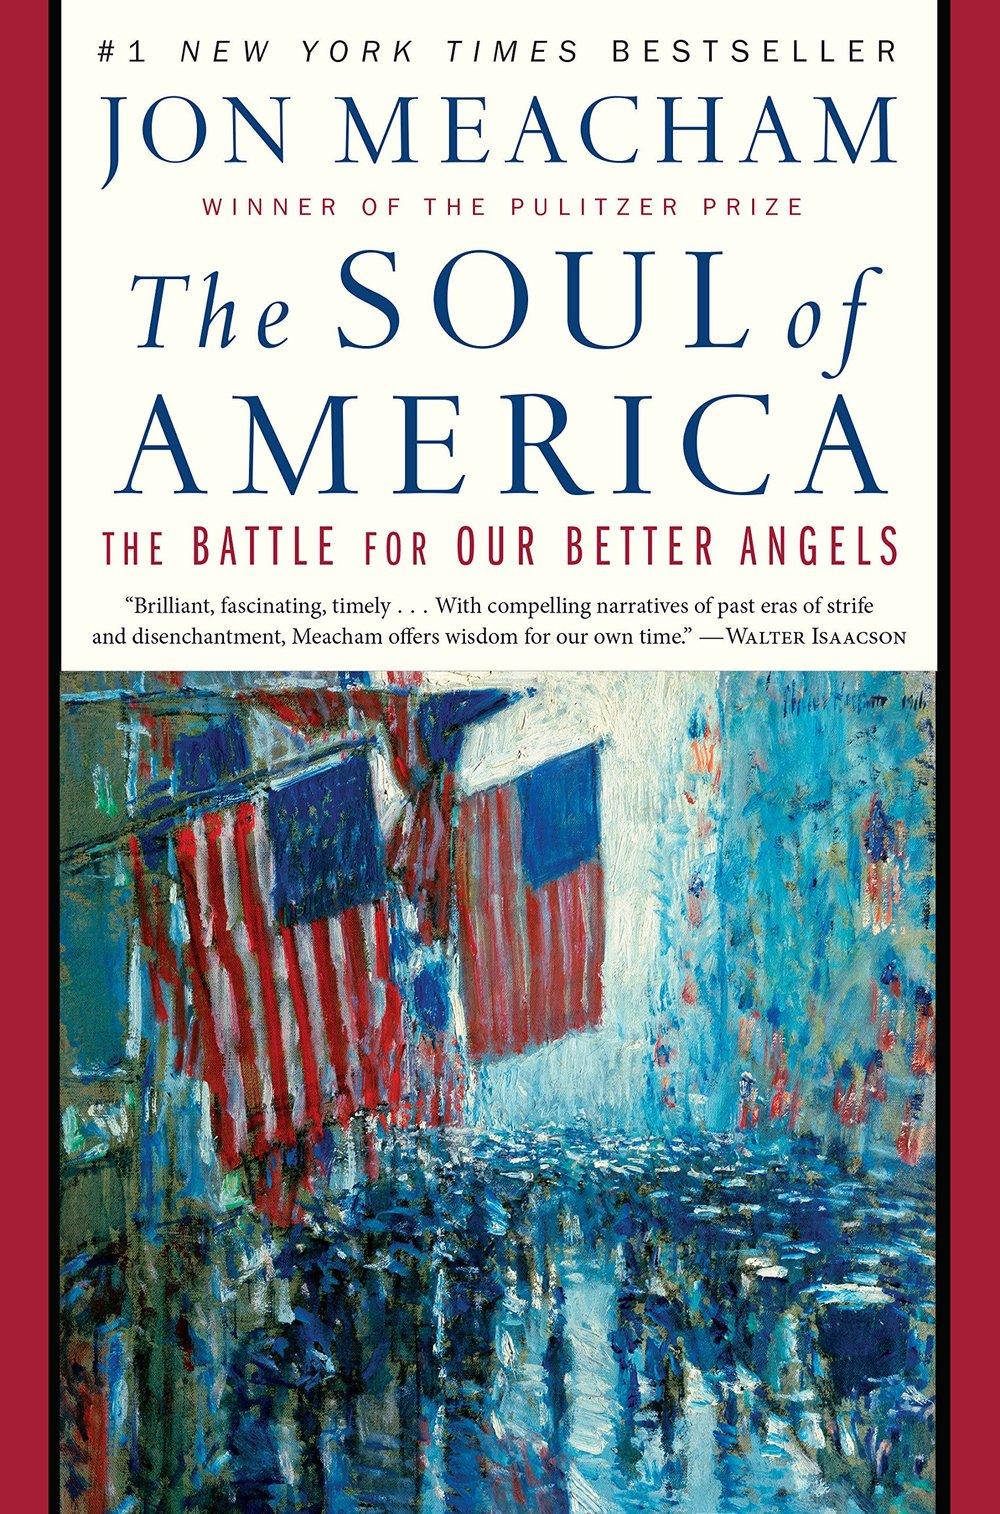 The Soul of America- The Battle for Our Better Angels - Jon Meacham.jpg